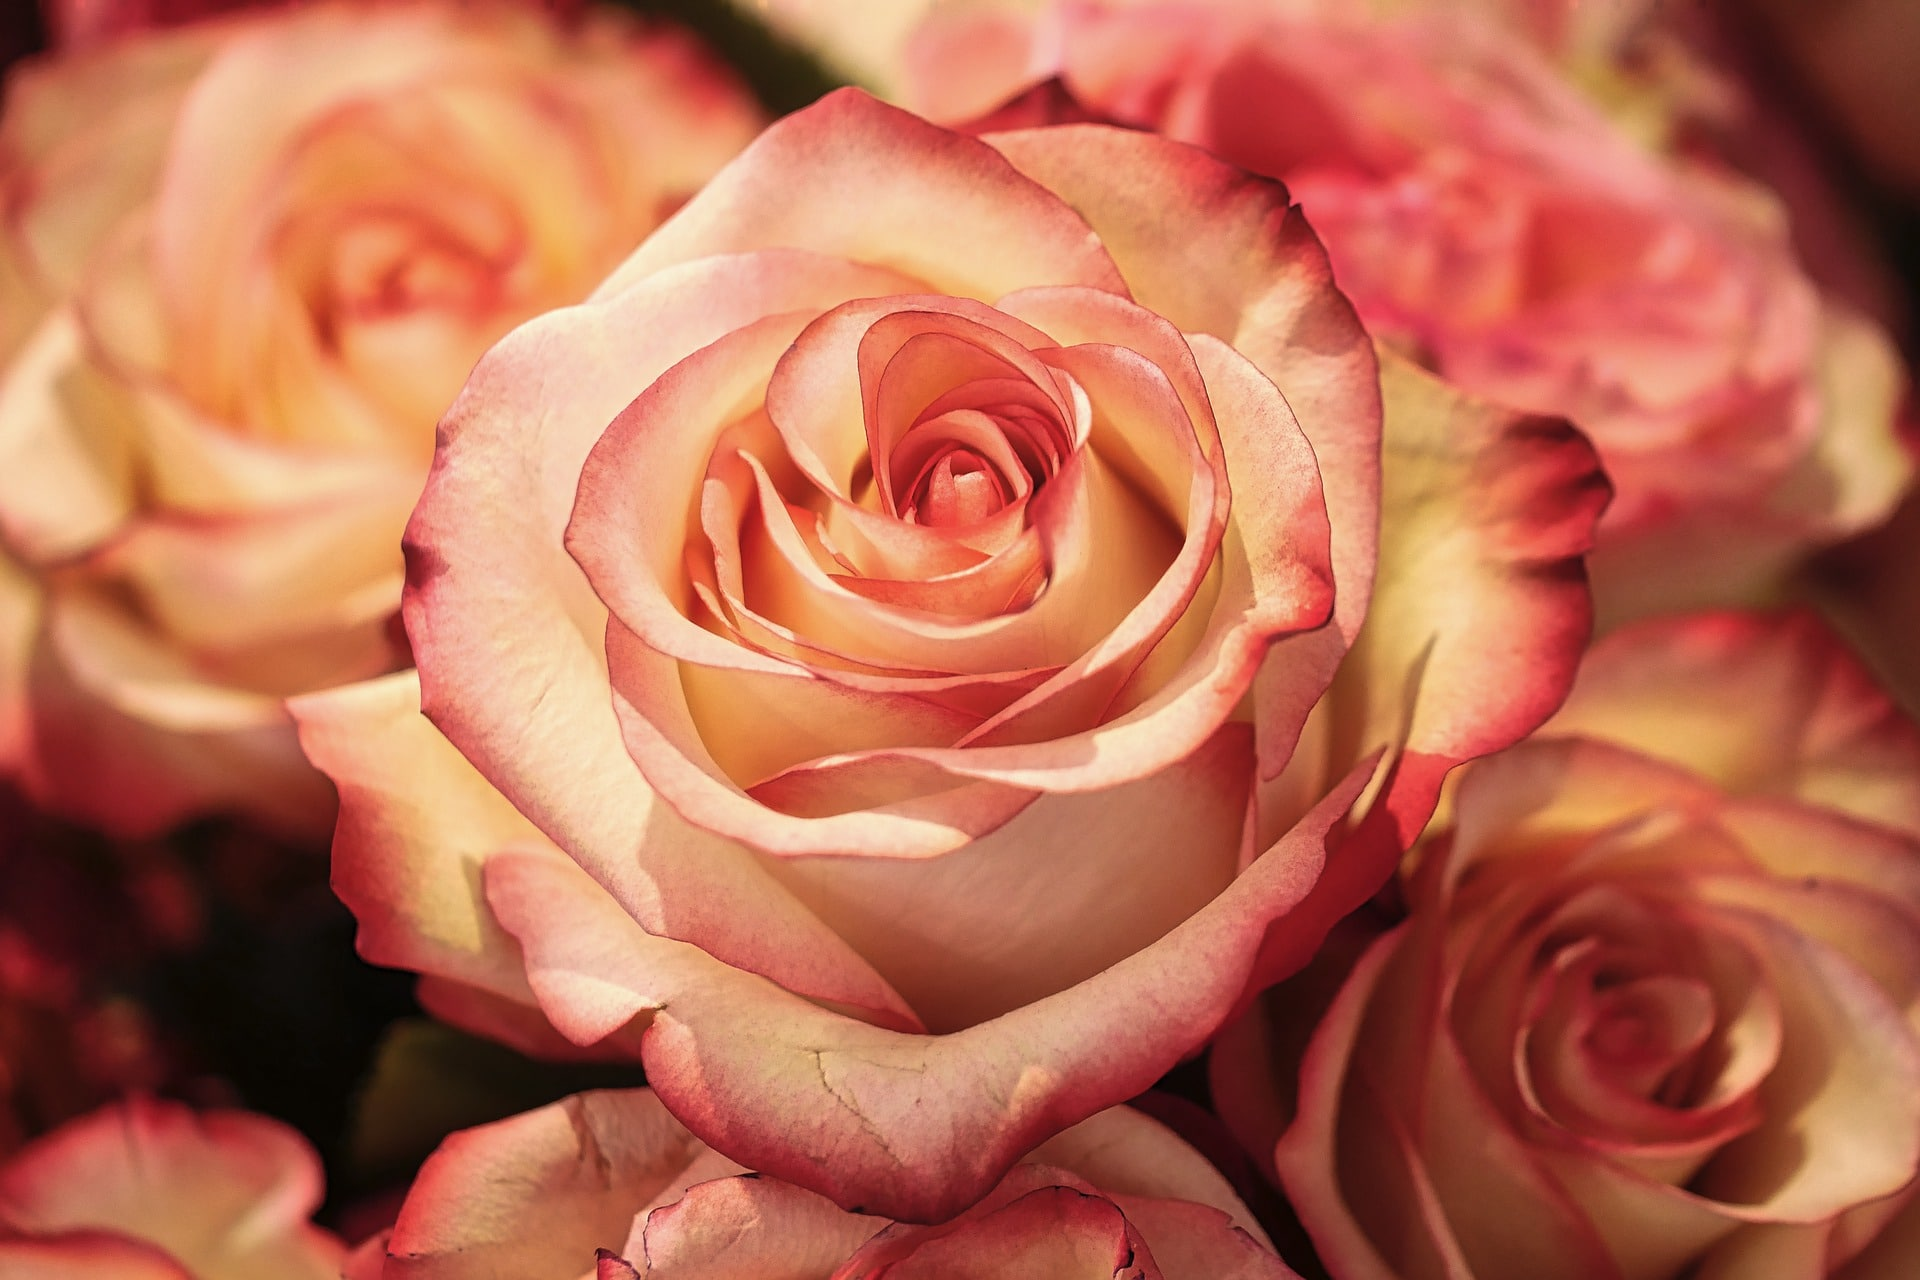 Antiossidanti naturali: l'interessante scoperta sui petali di Rosa